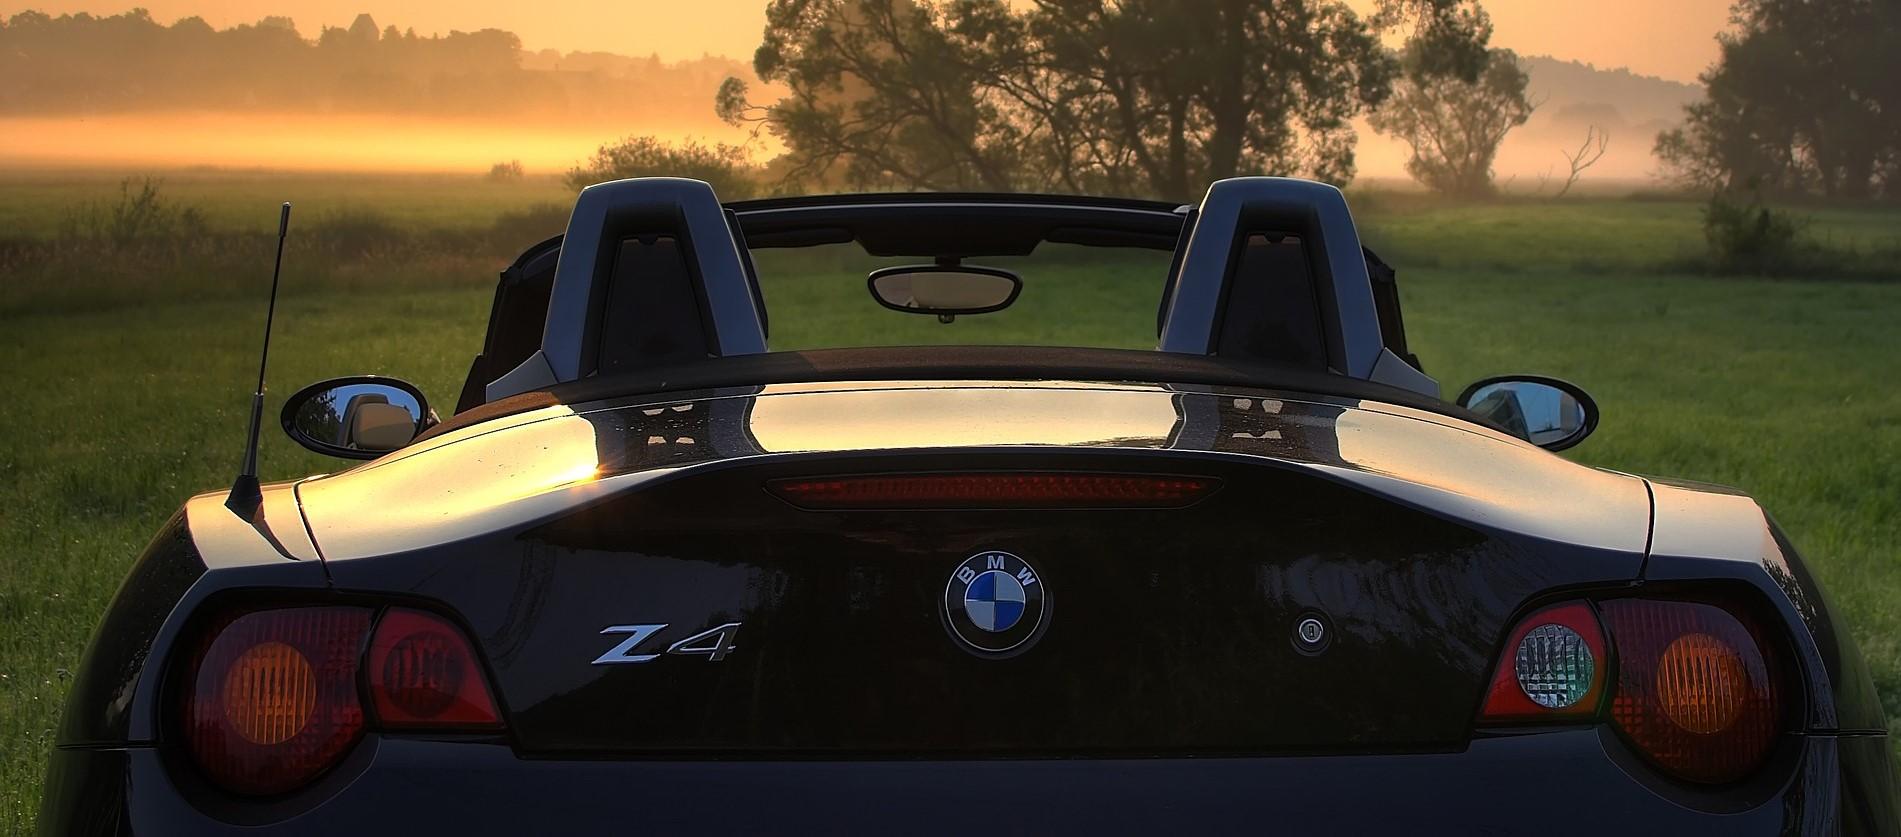 BMW Z4 Roadster in Salem, Oregon | Breast Cancer Car Donations